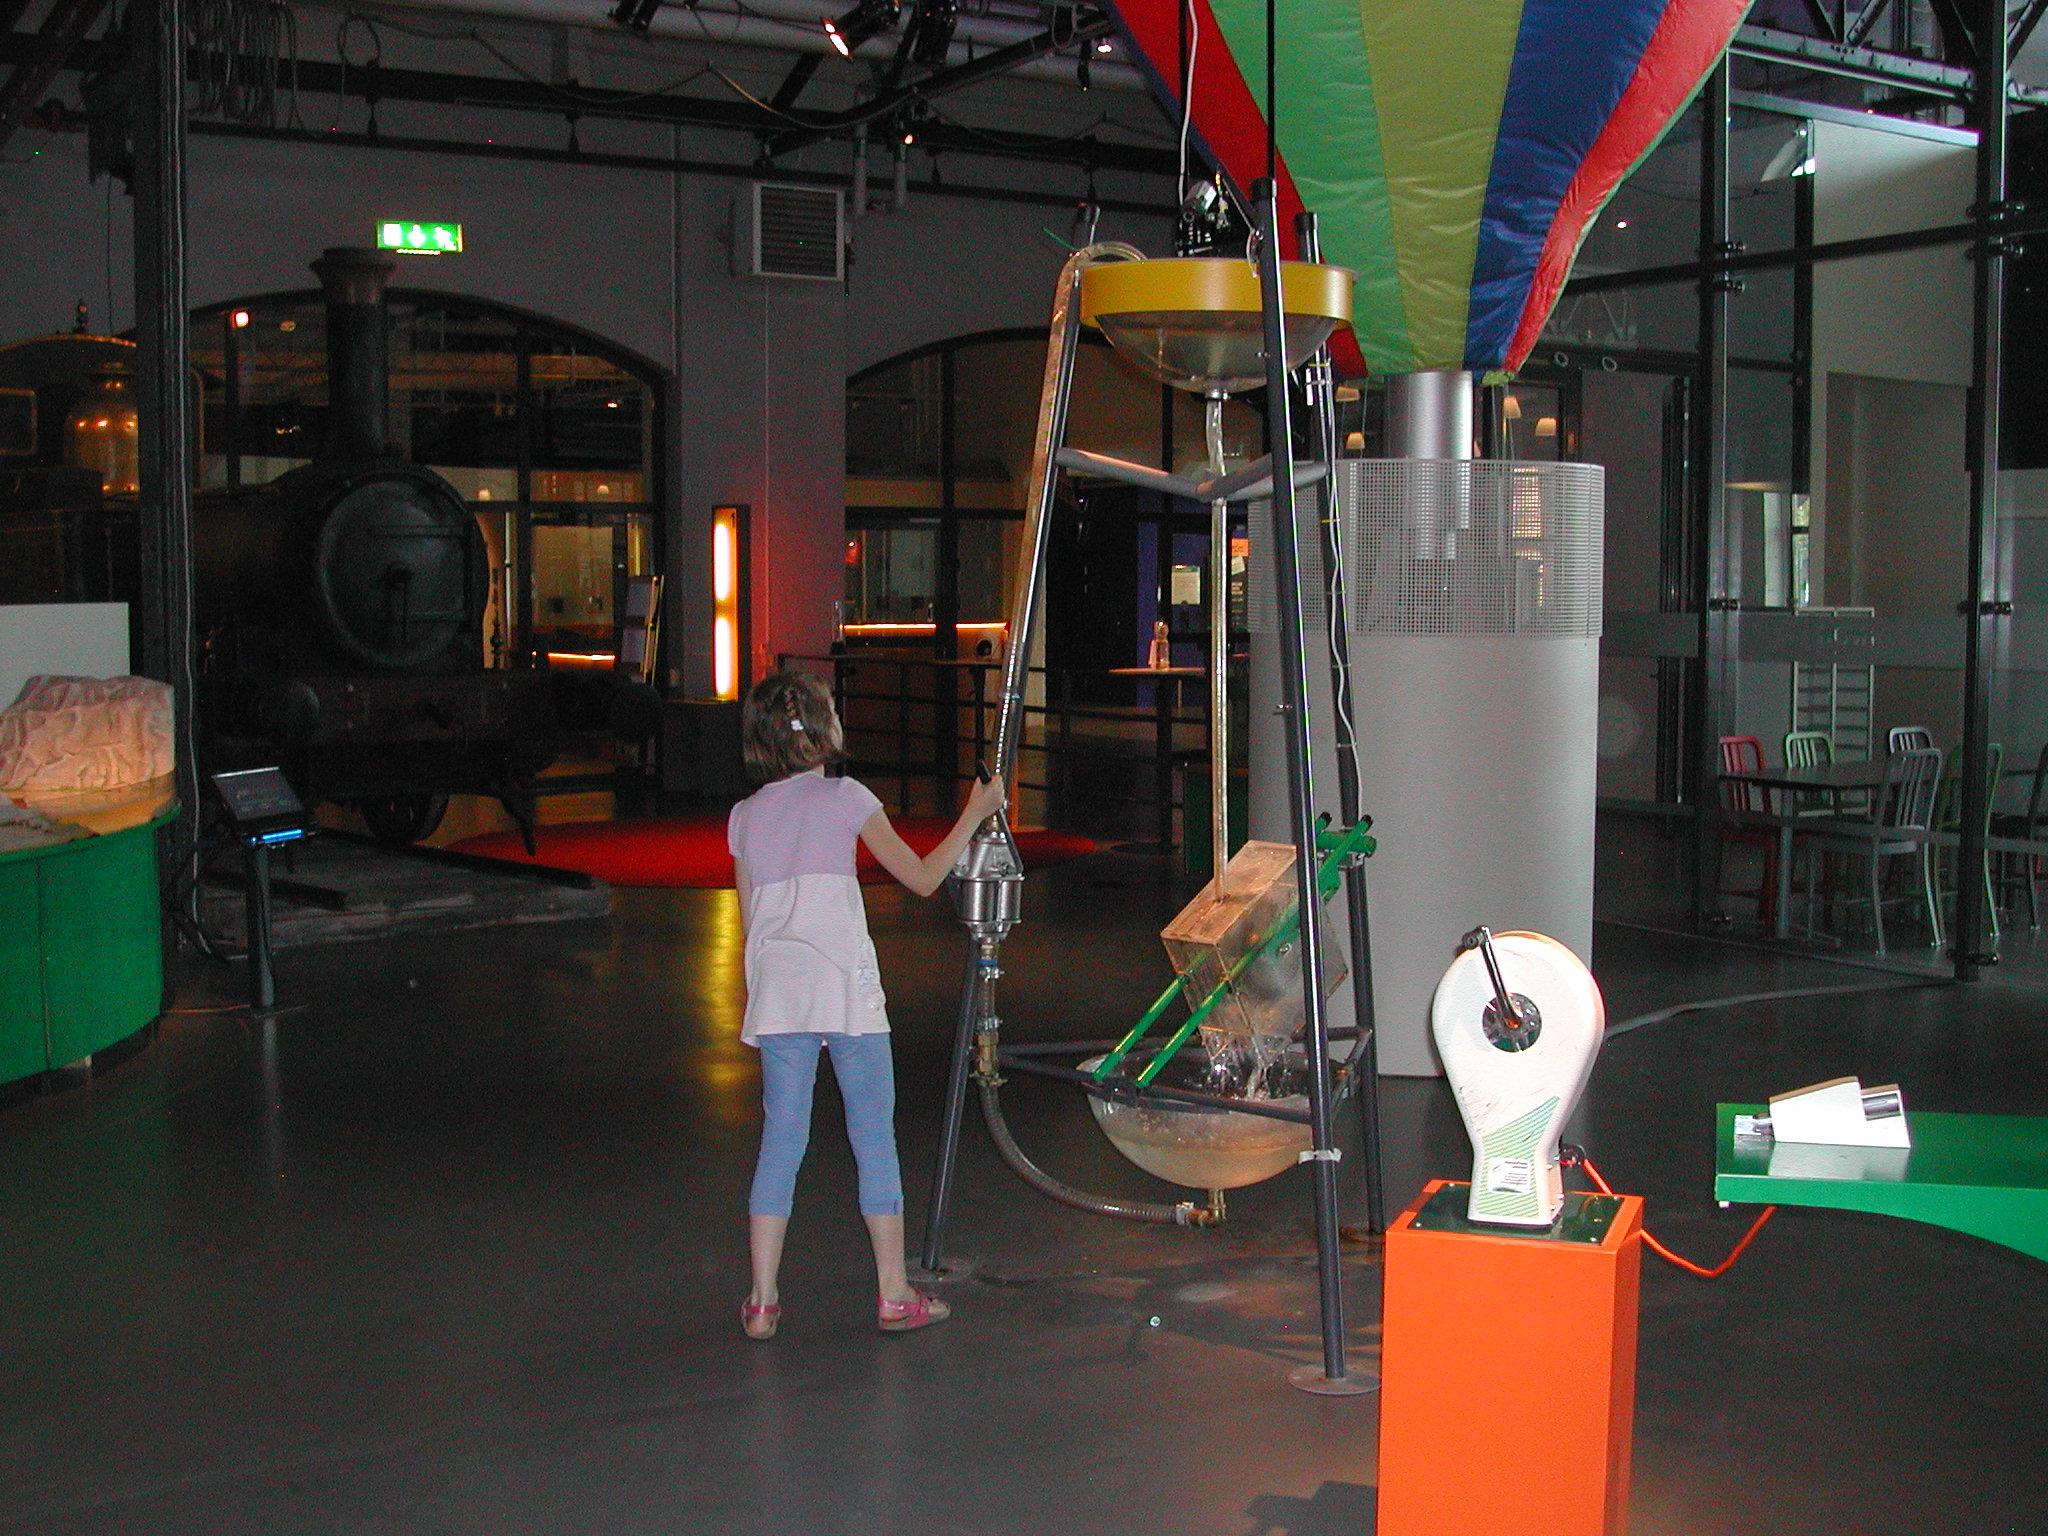 Innovatum sciencecenter, Trollhättan, Sweden